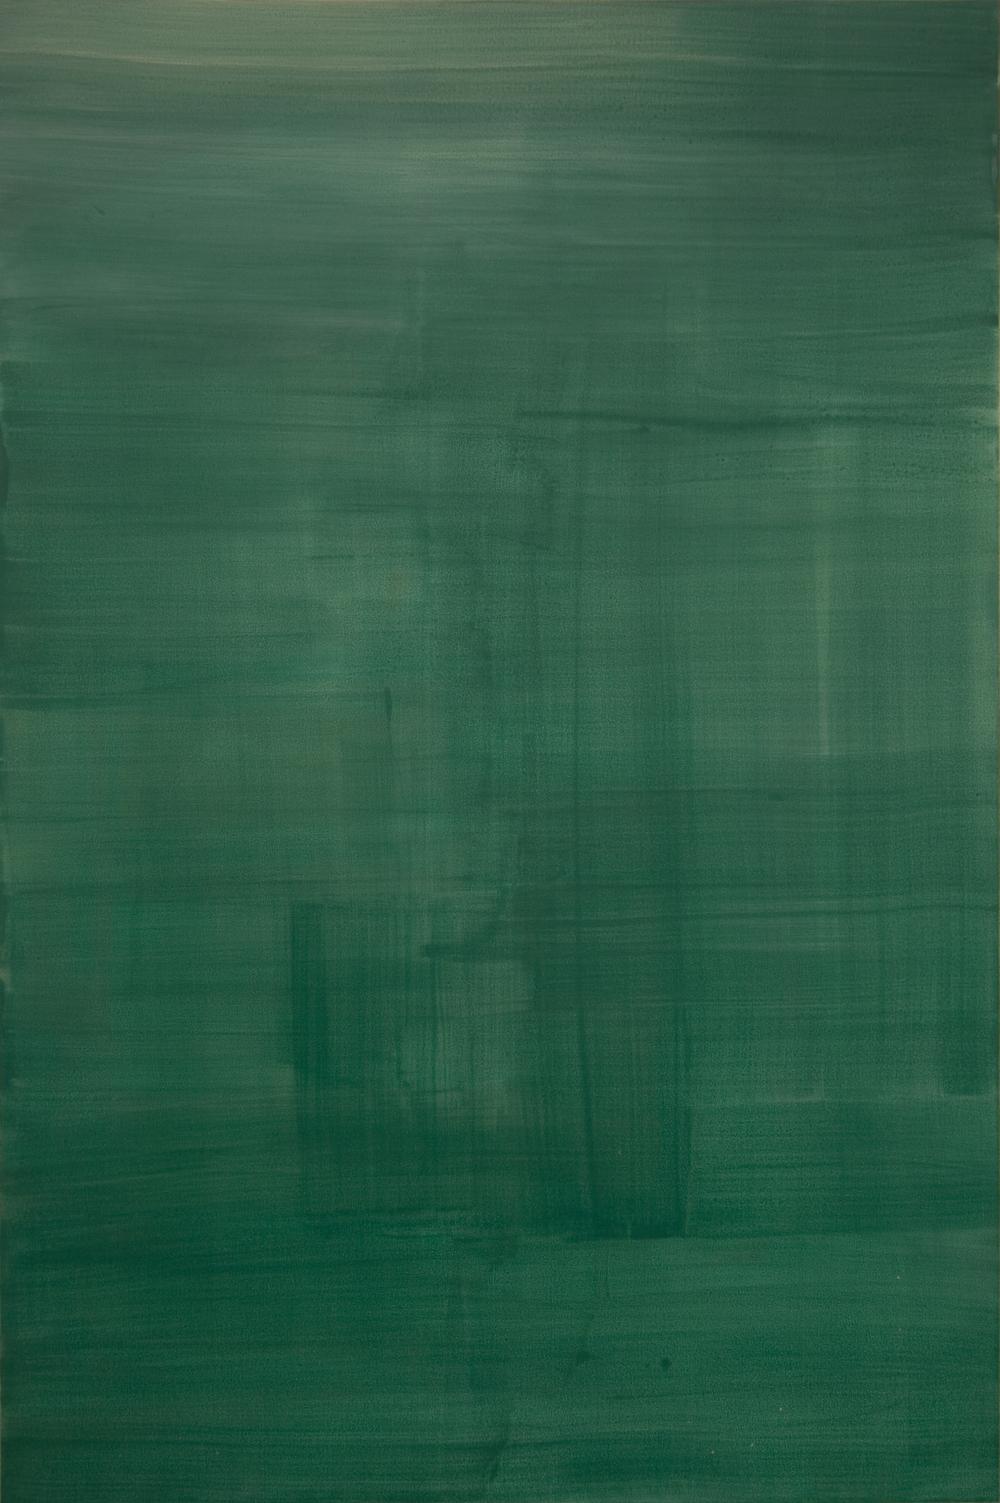 2012, acrylic on canvas,150 x 225 cm (59 x 88 1/2 in)